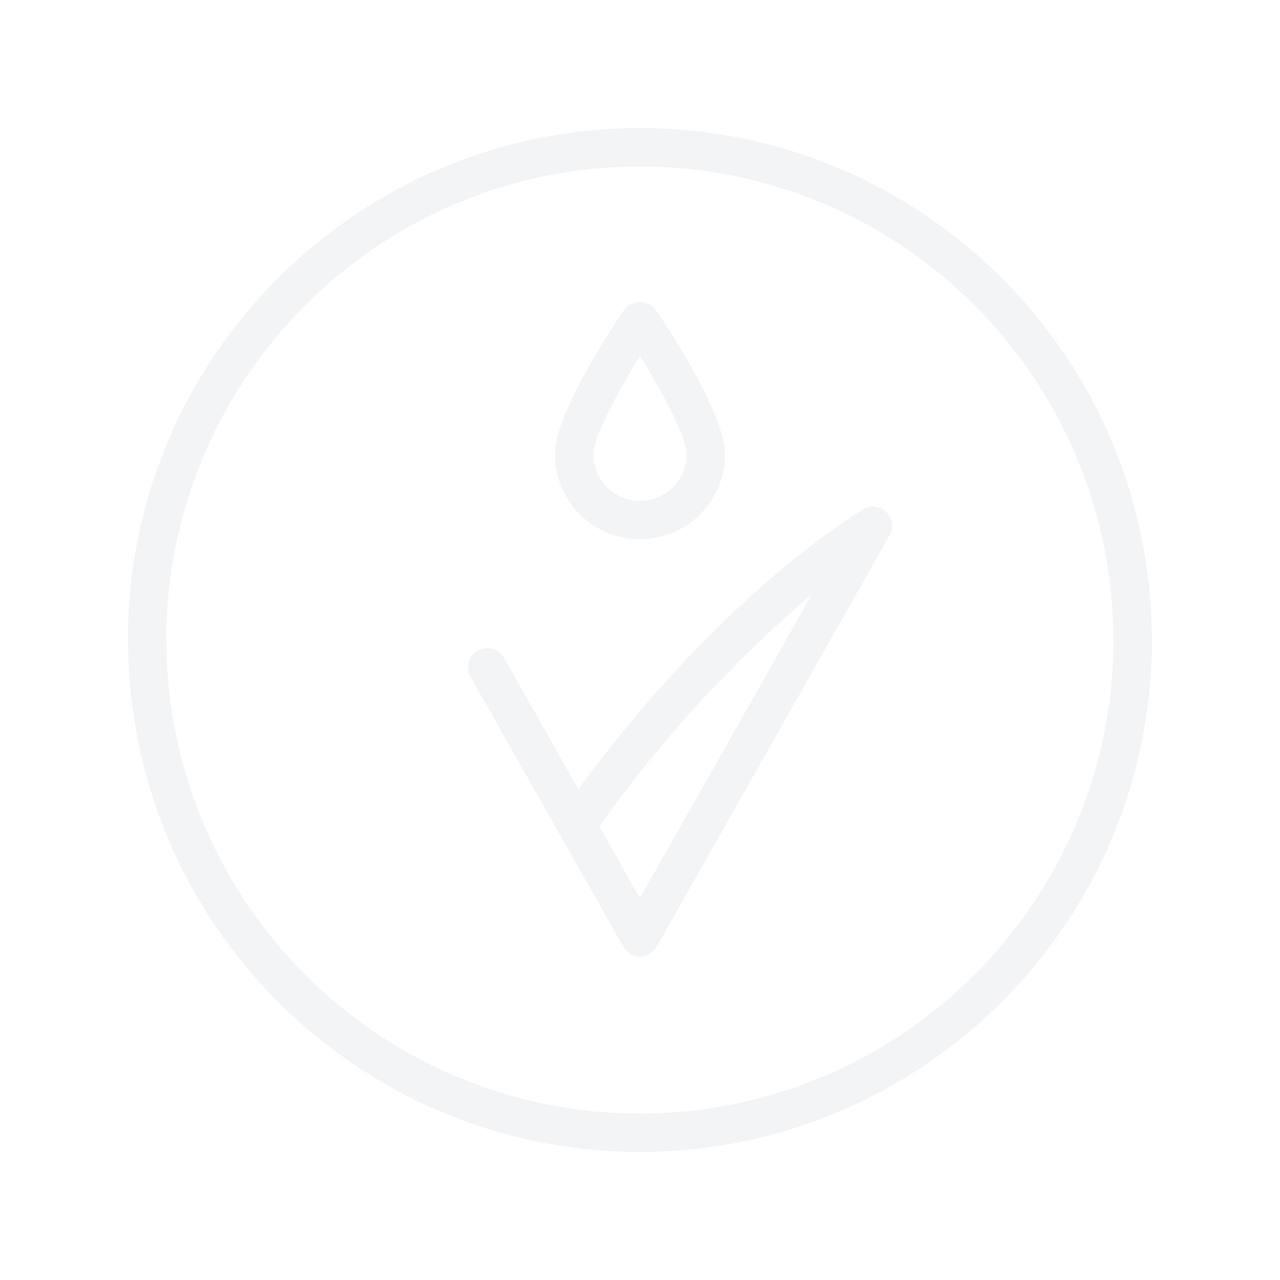 HOLIKA HOLIKA Shimmering Petit сияющий ББ-крем SPF45 30ml